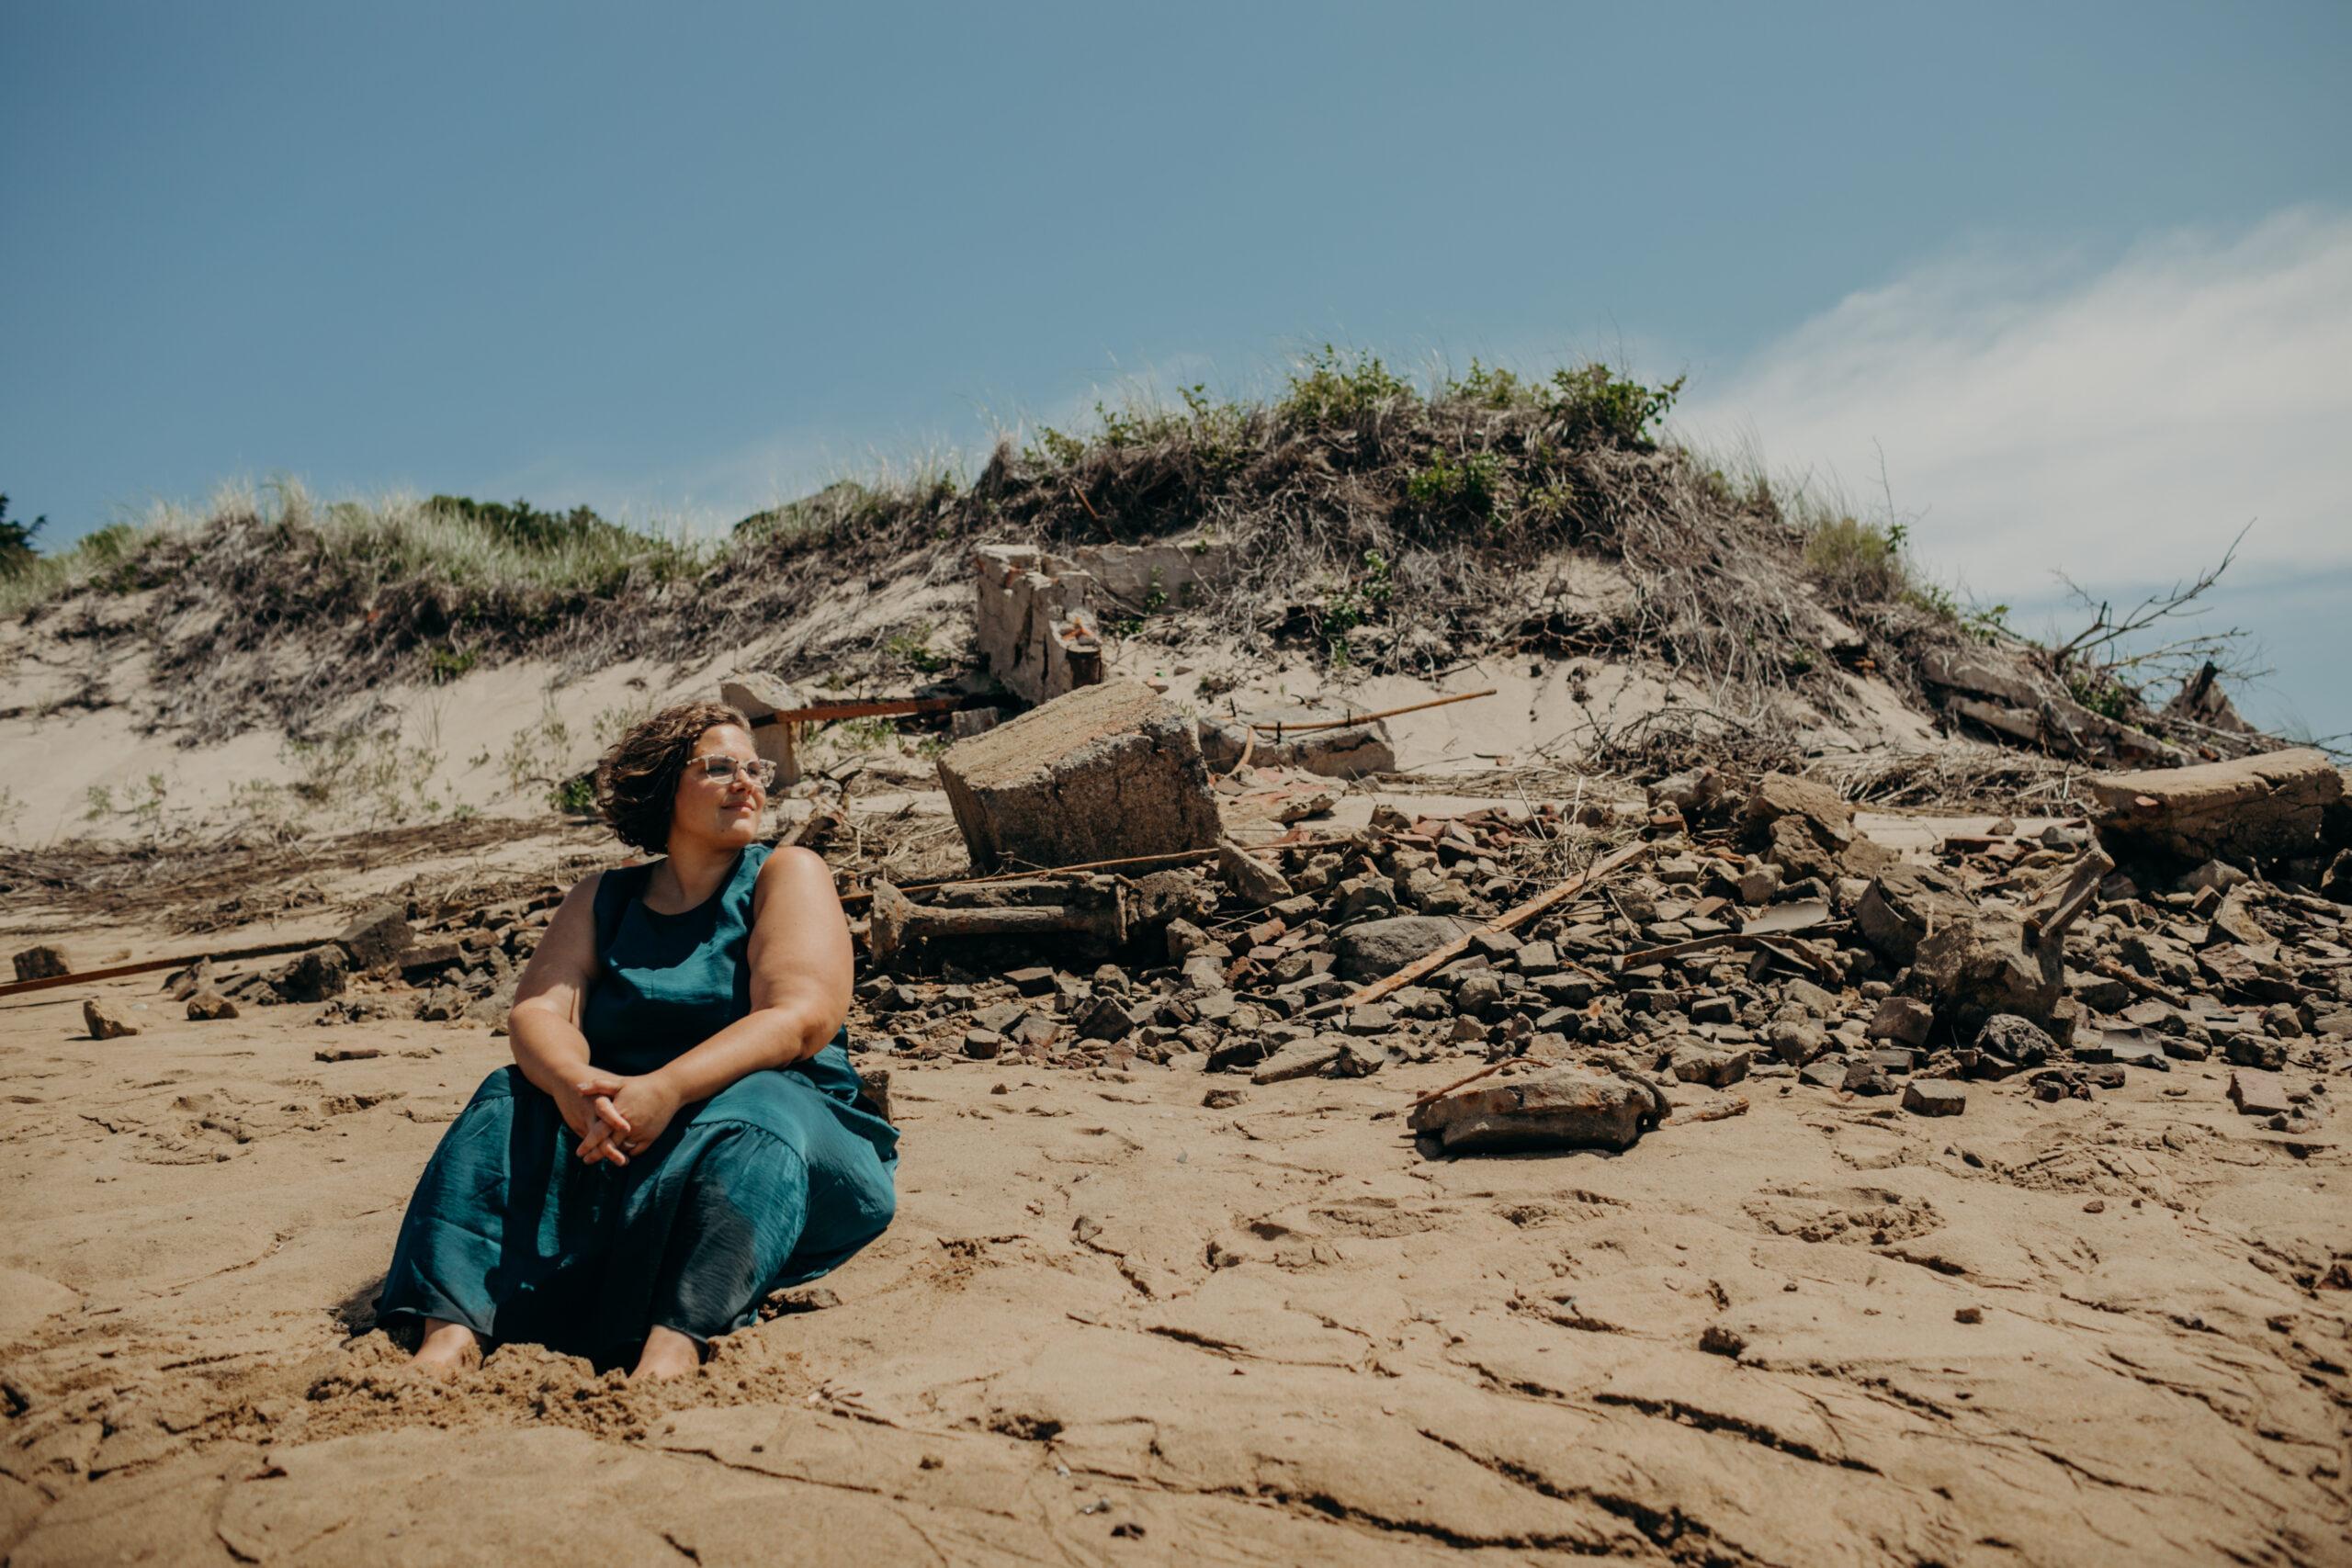 Mara-PortraitsSummer2021-EmilyTebbettsPhotography-159